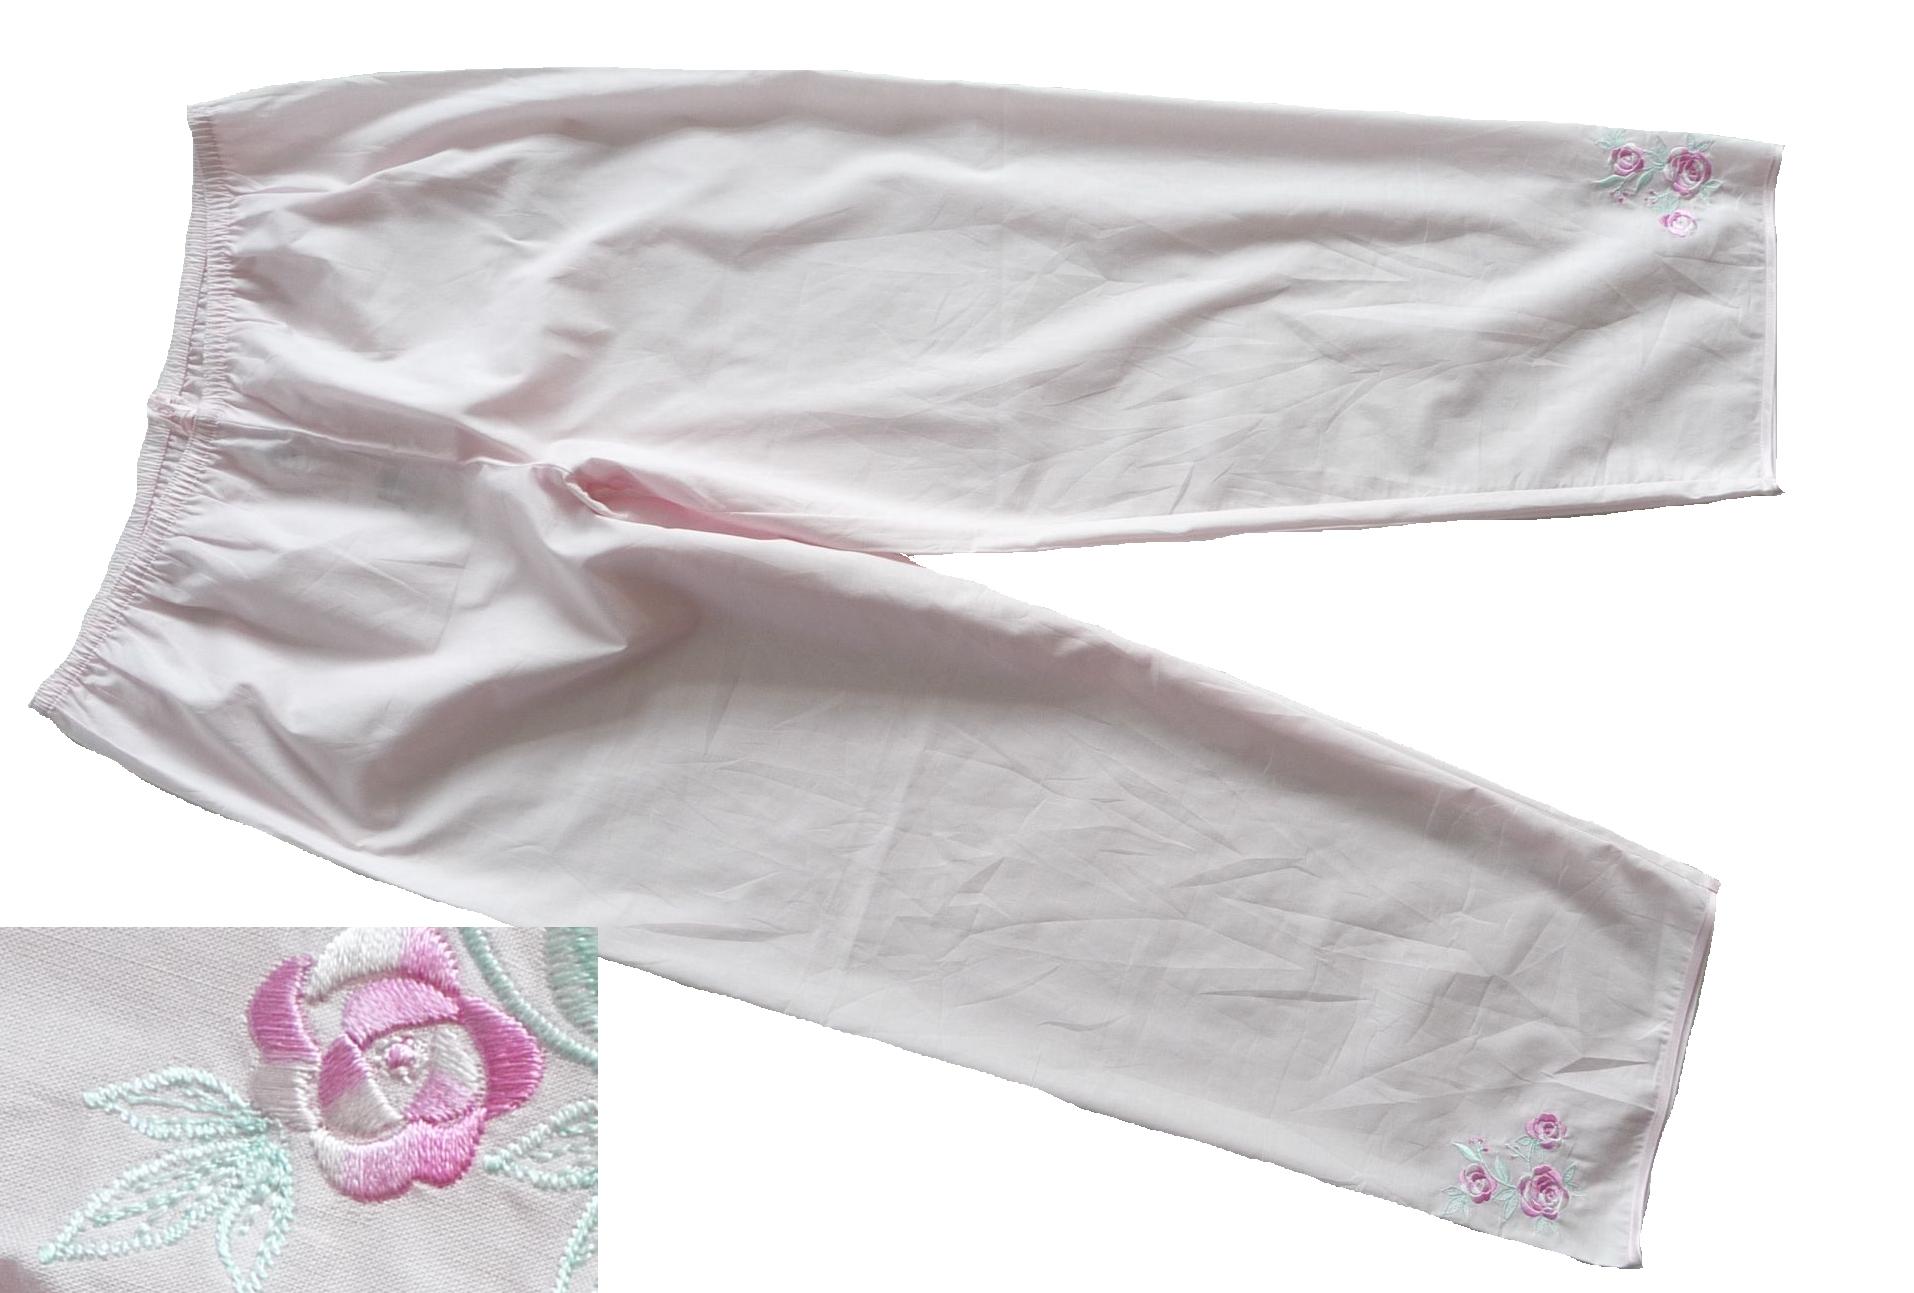 M&S Spodnie od piżamy 42 cienkie, haft 8a519